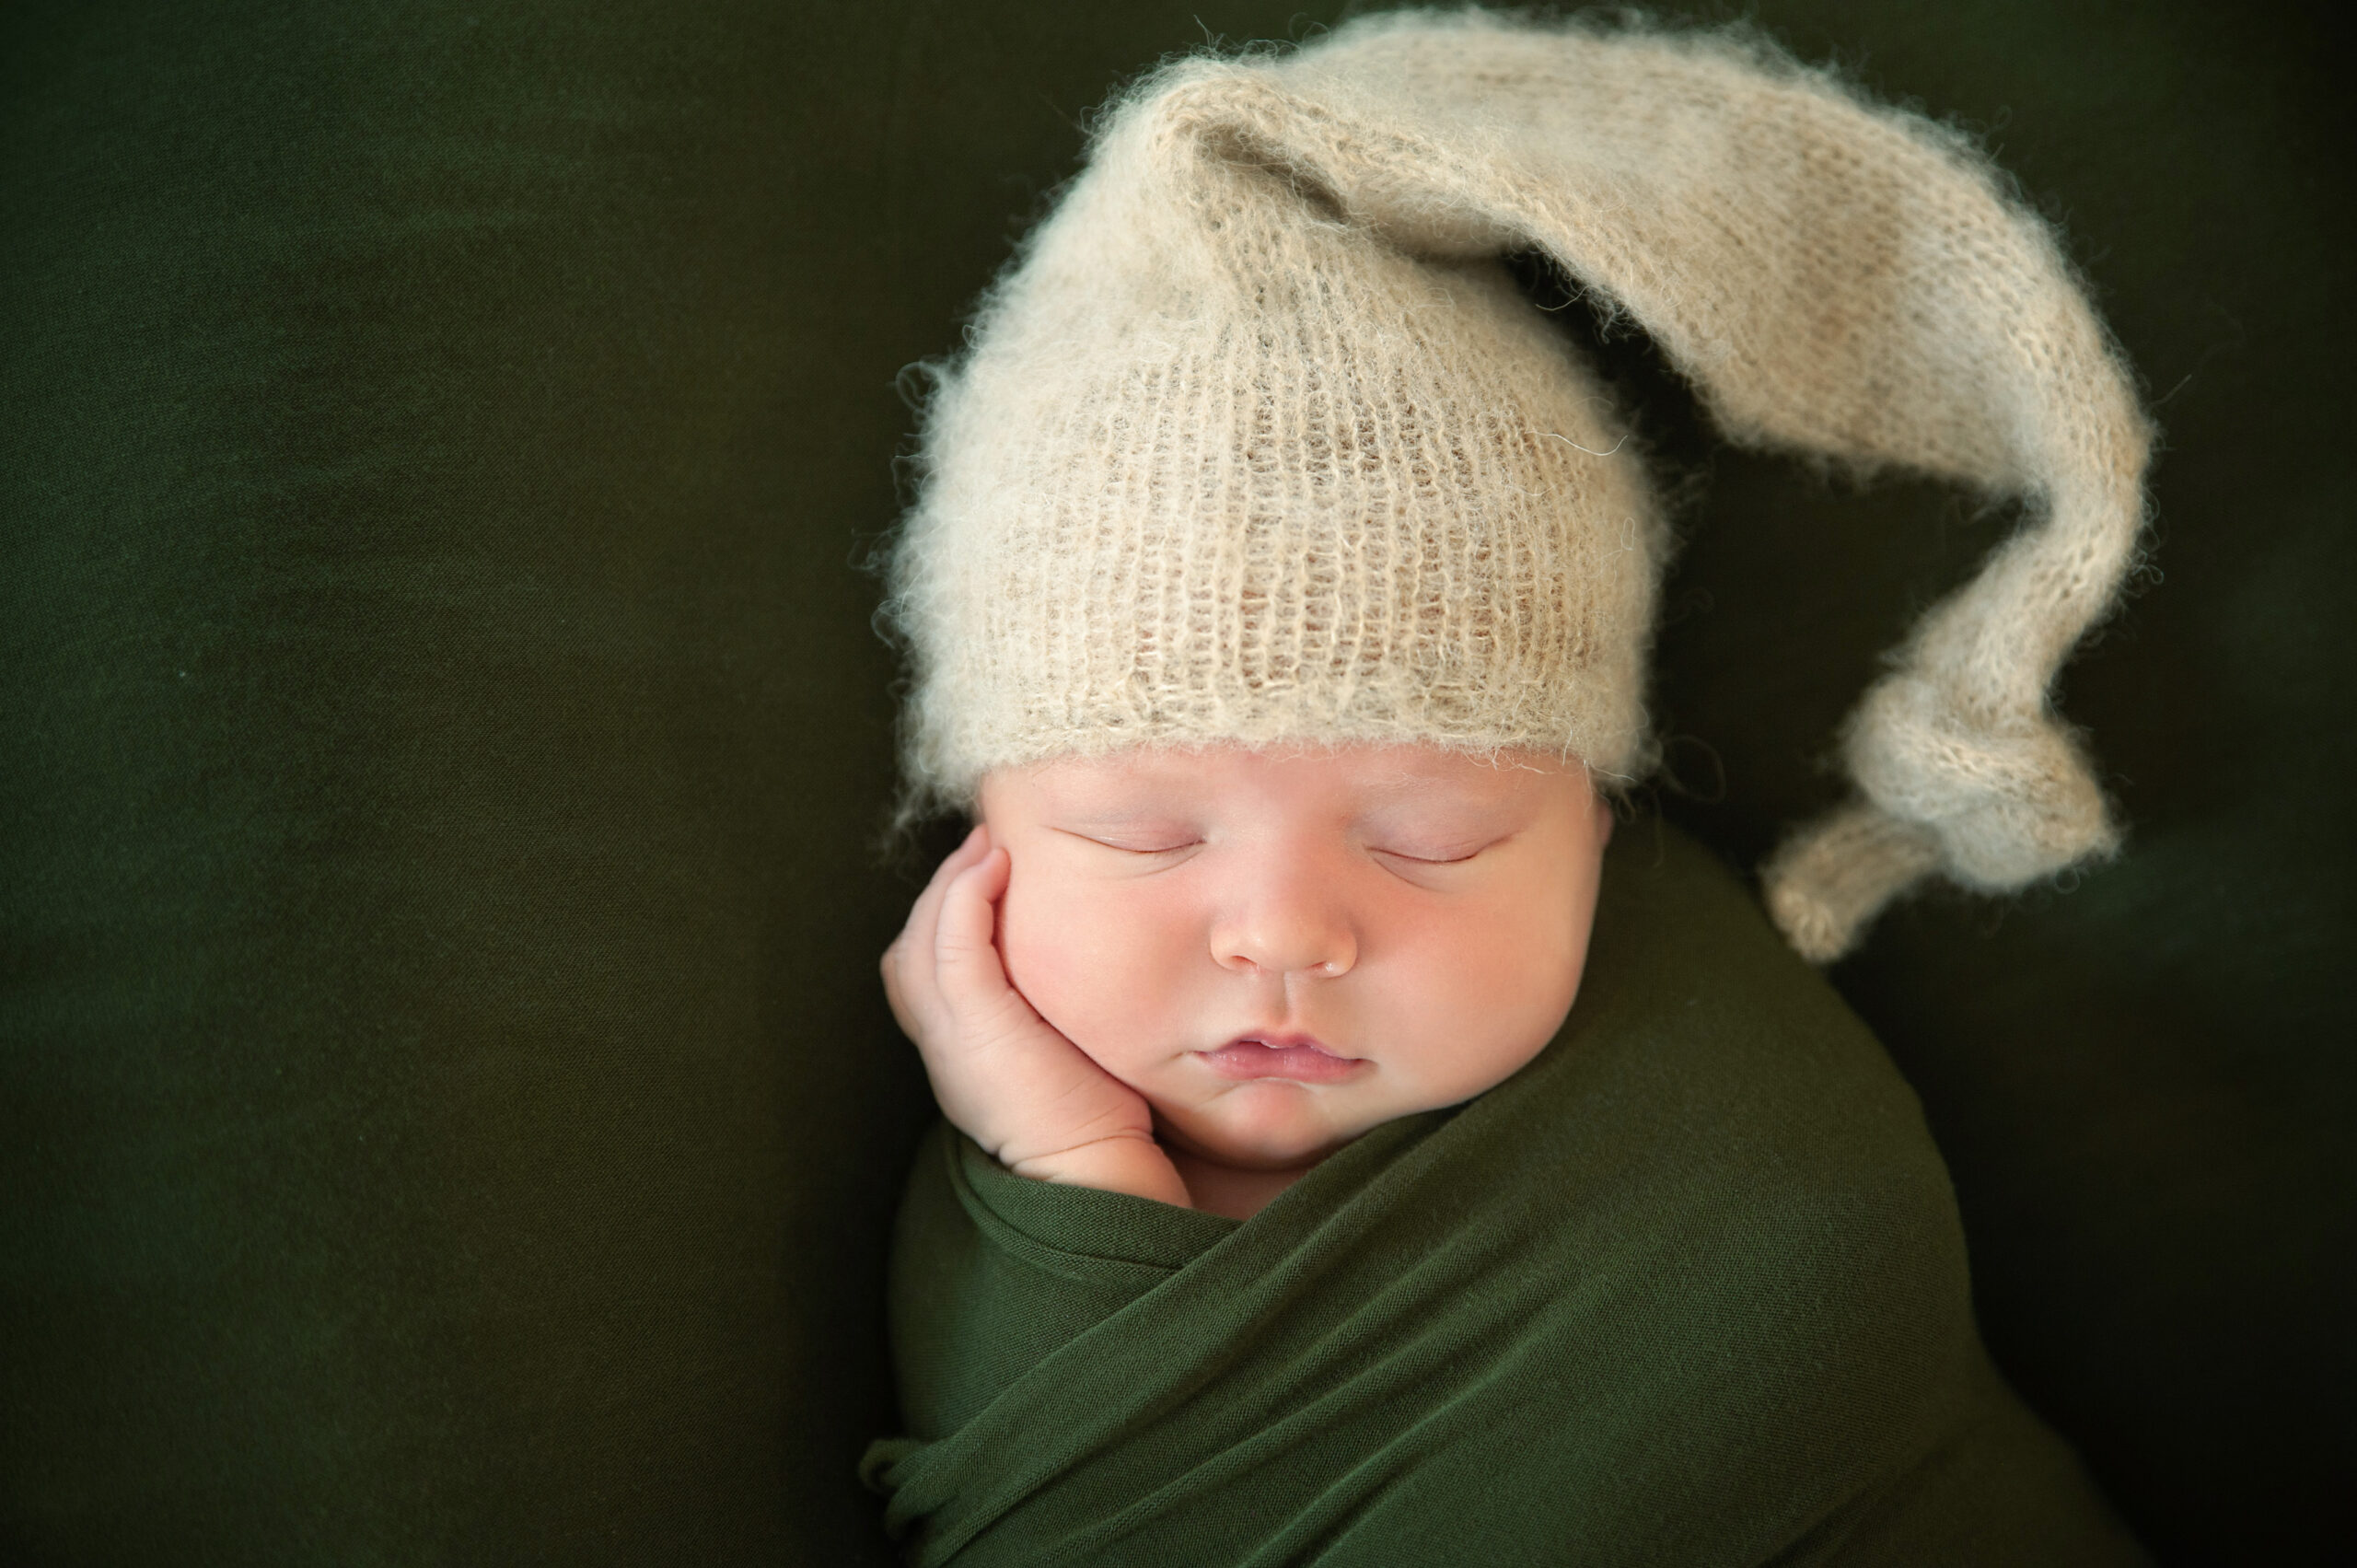 newborn photographer, newborn photography, colorado newborn photographer, colorado newborn photography